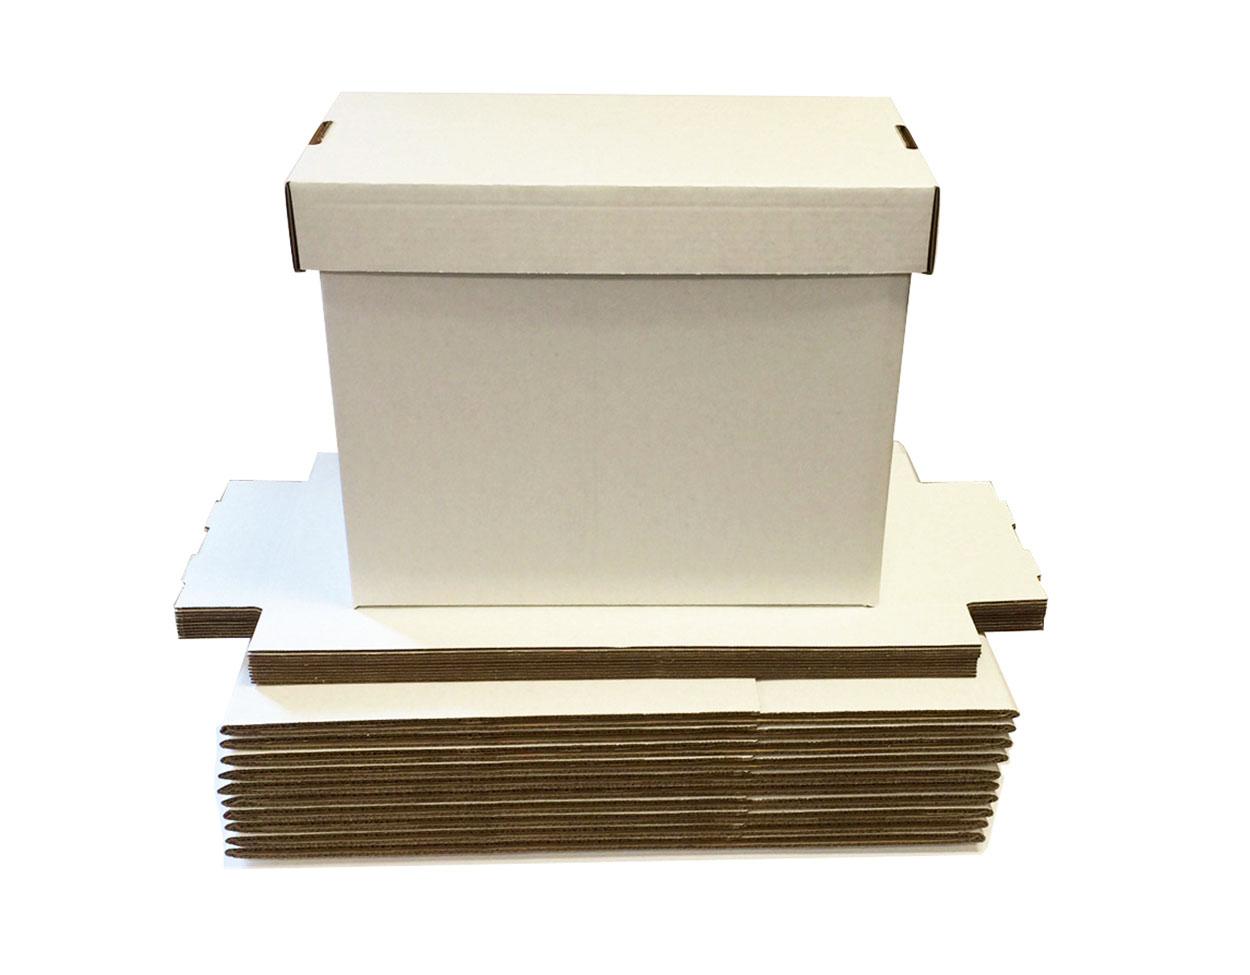 10 Short Comic Storage Boxes NEW Cardboard Max Pro Quality Archival Storage  Box